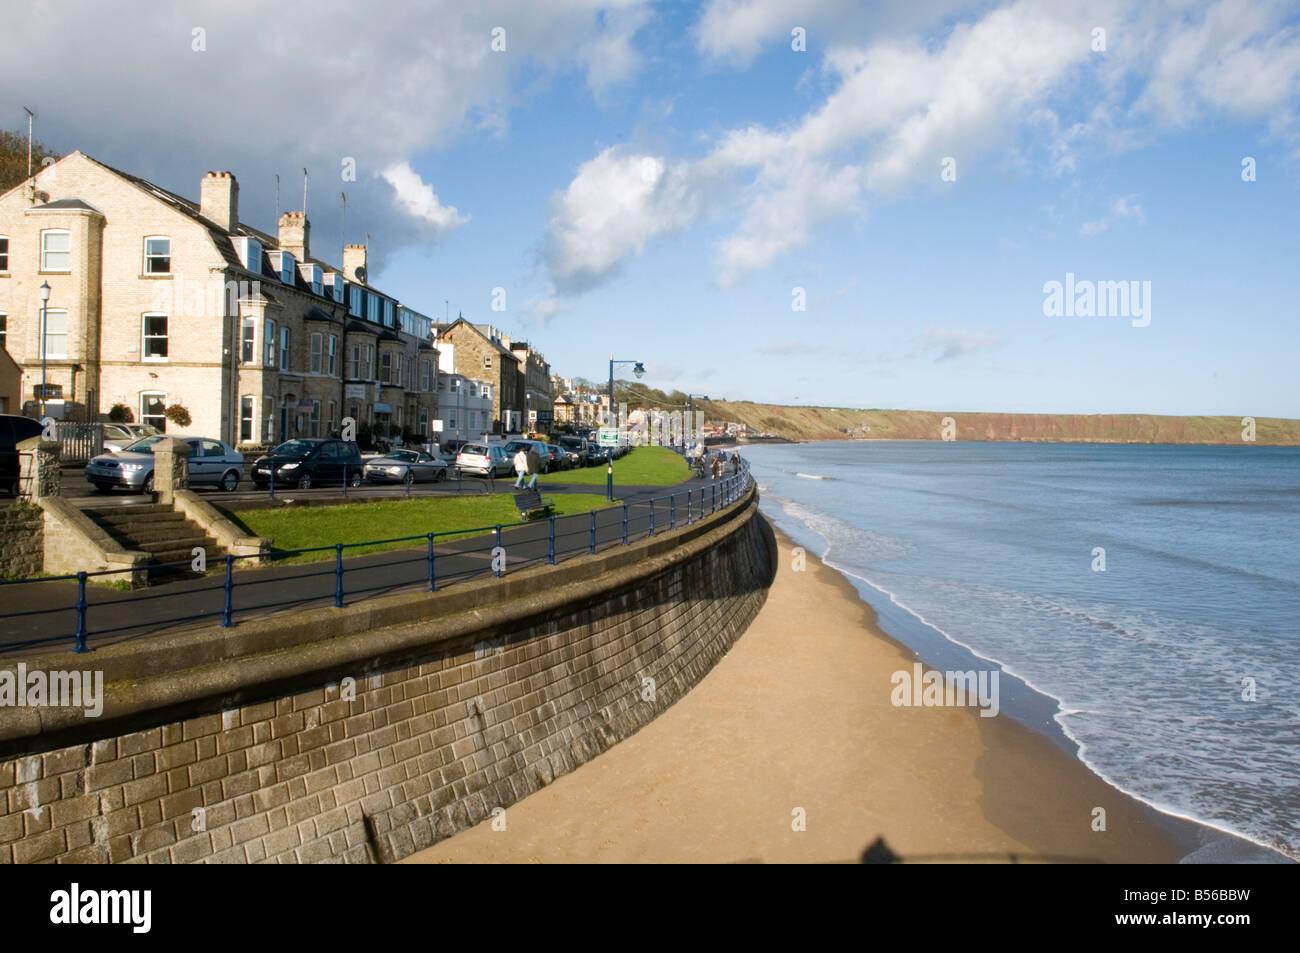 filey east yorkshire coast coastline beach resort small northern uk england british sea seaside - Stock Image